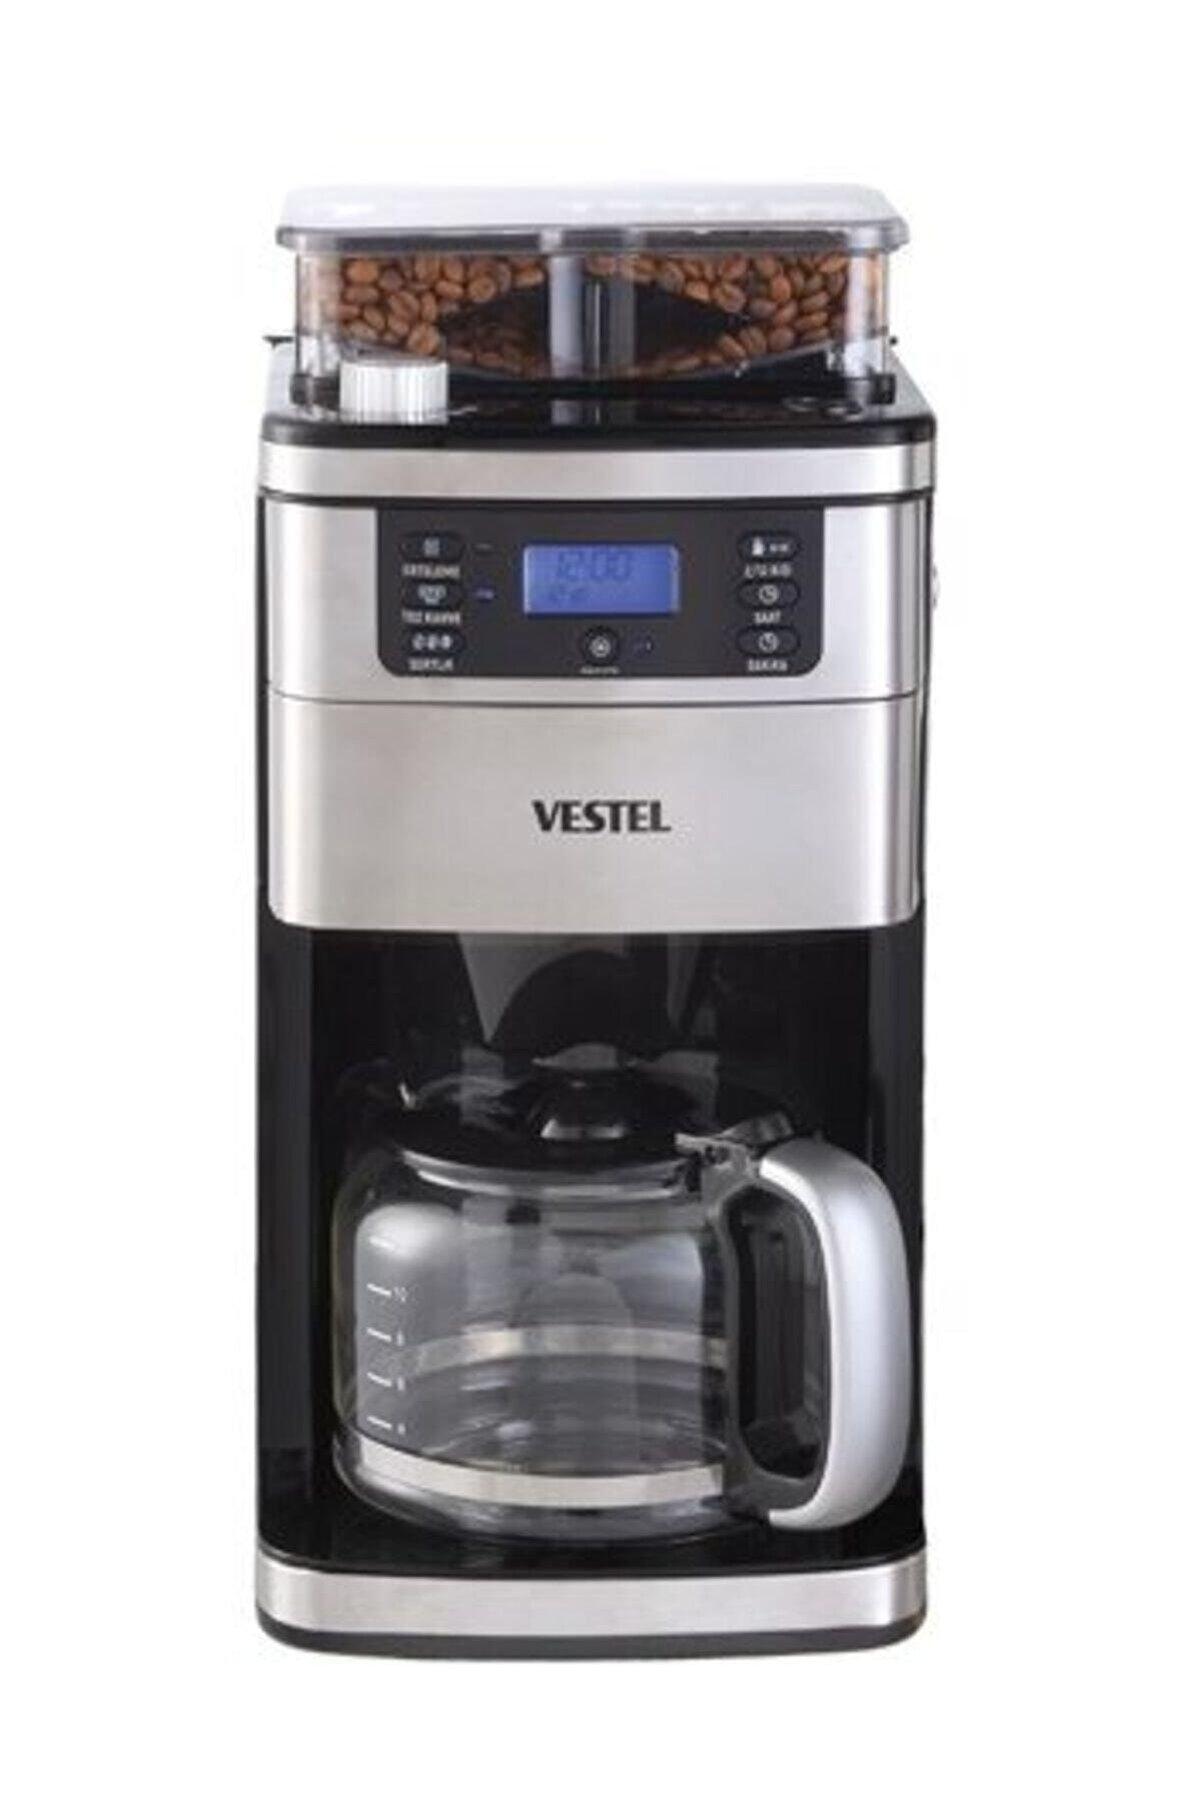 VESTEL Taze Kahve Makinesi